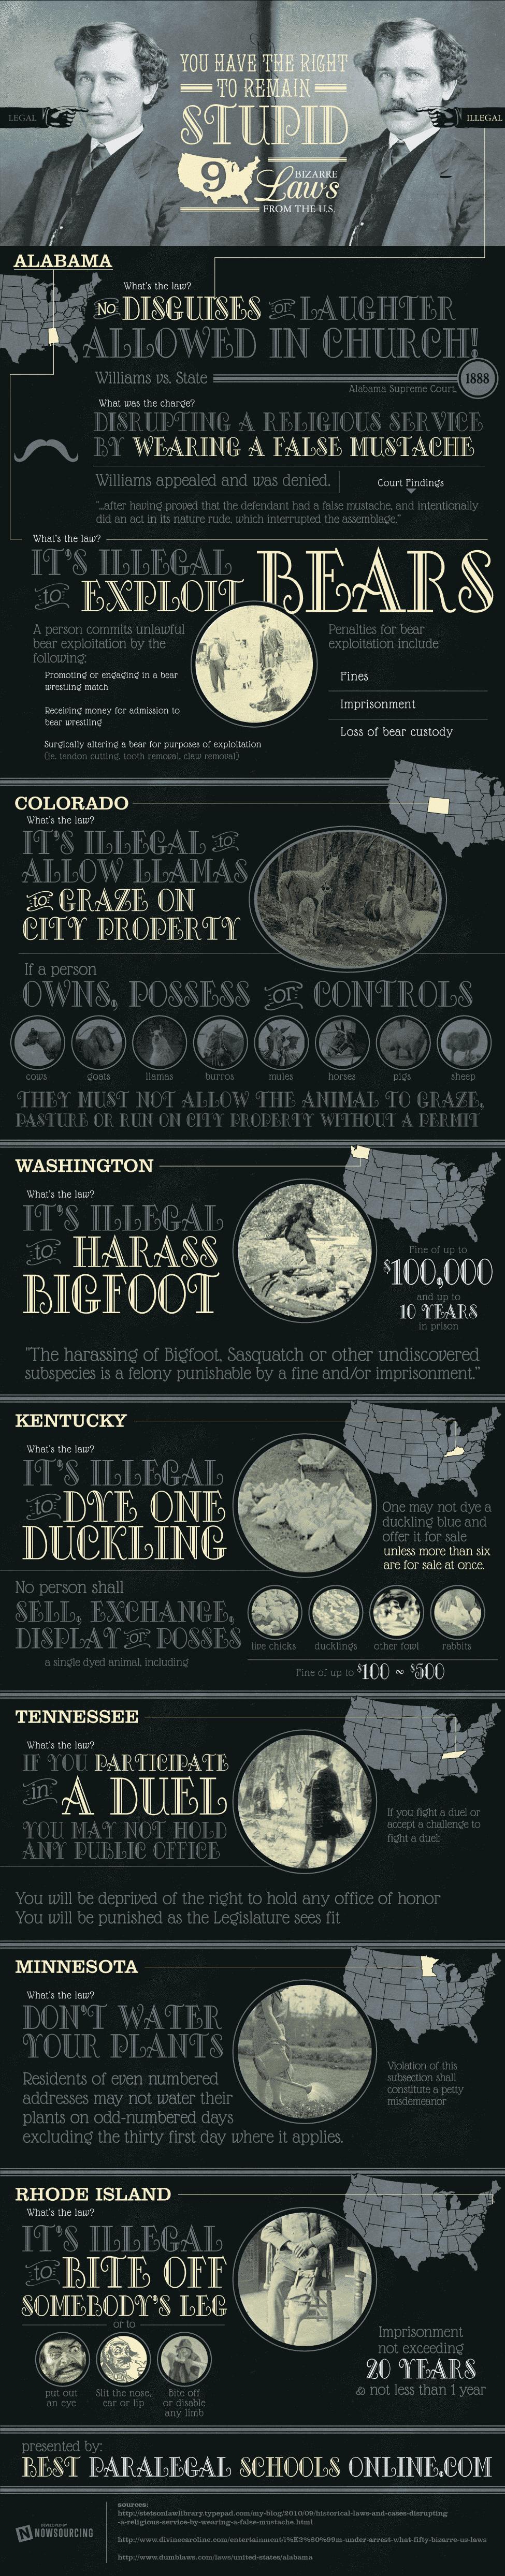 9-bizarre-laws-america-infographic